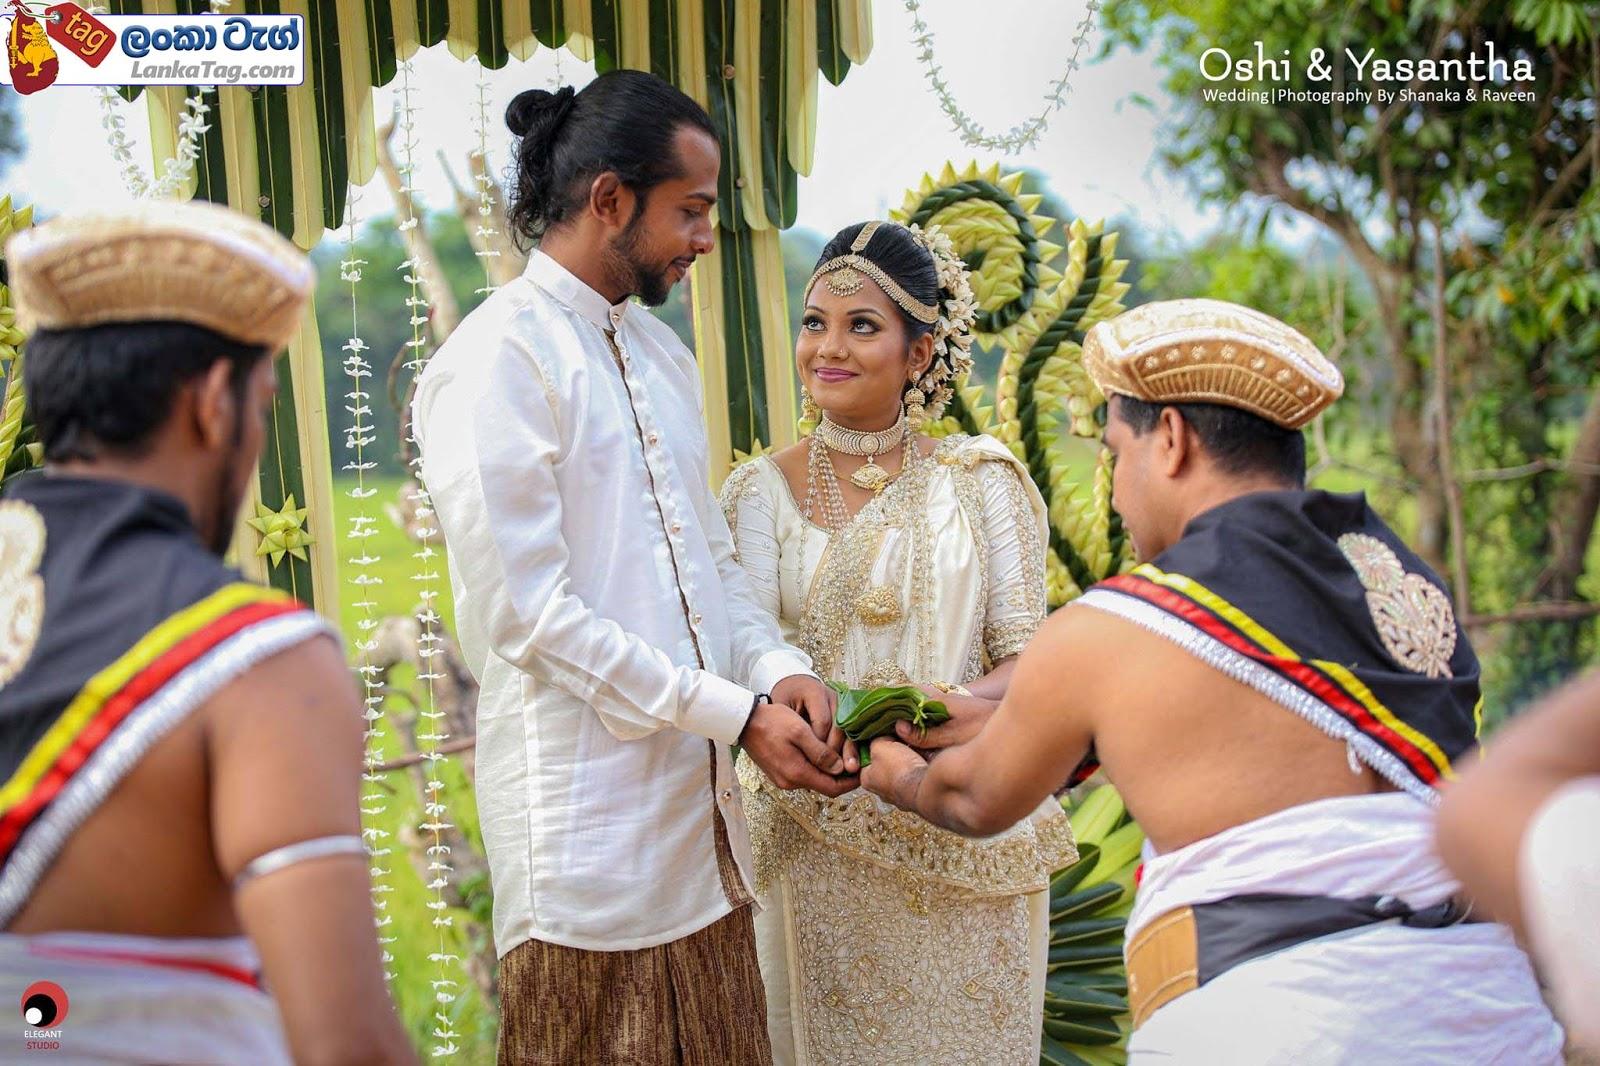 sri lankan wedding dress  6